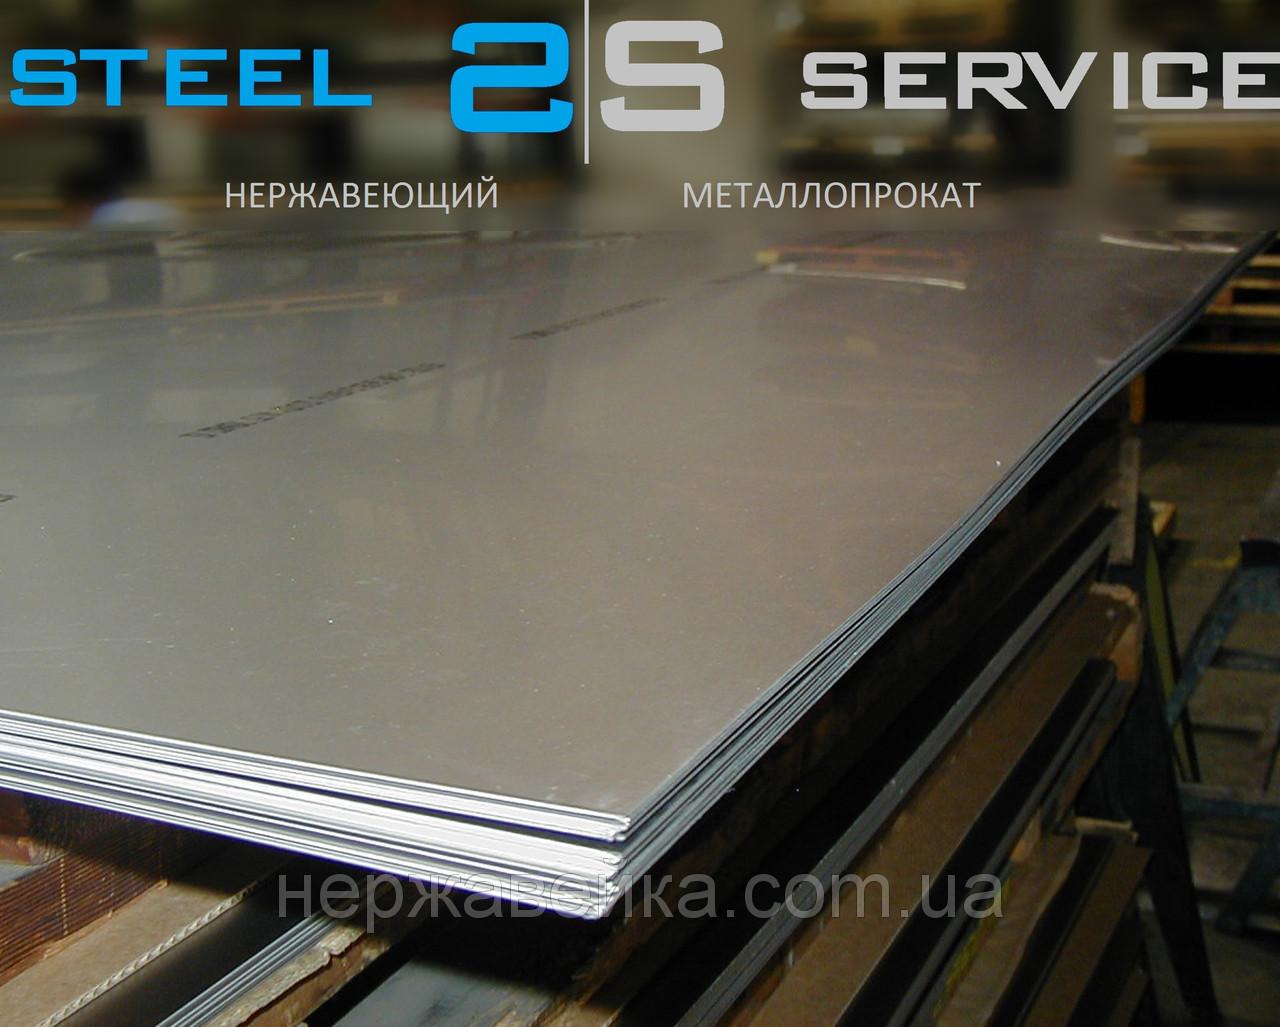 Листовая нержавейка 0,8х1250х2500мм AISI 409(08Х13) 2B - матовый, технический